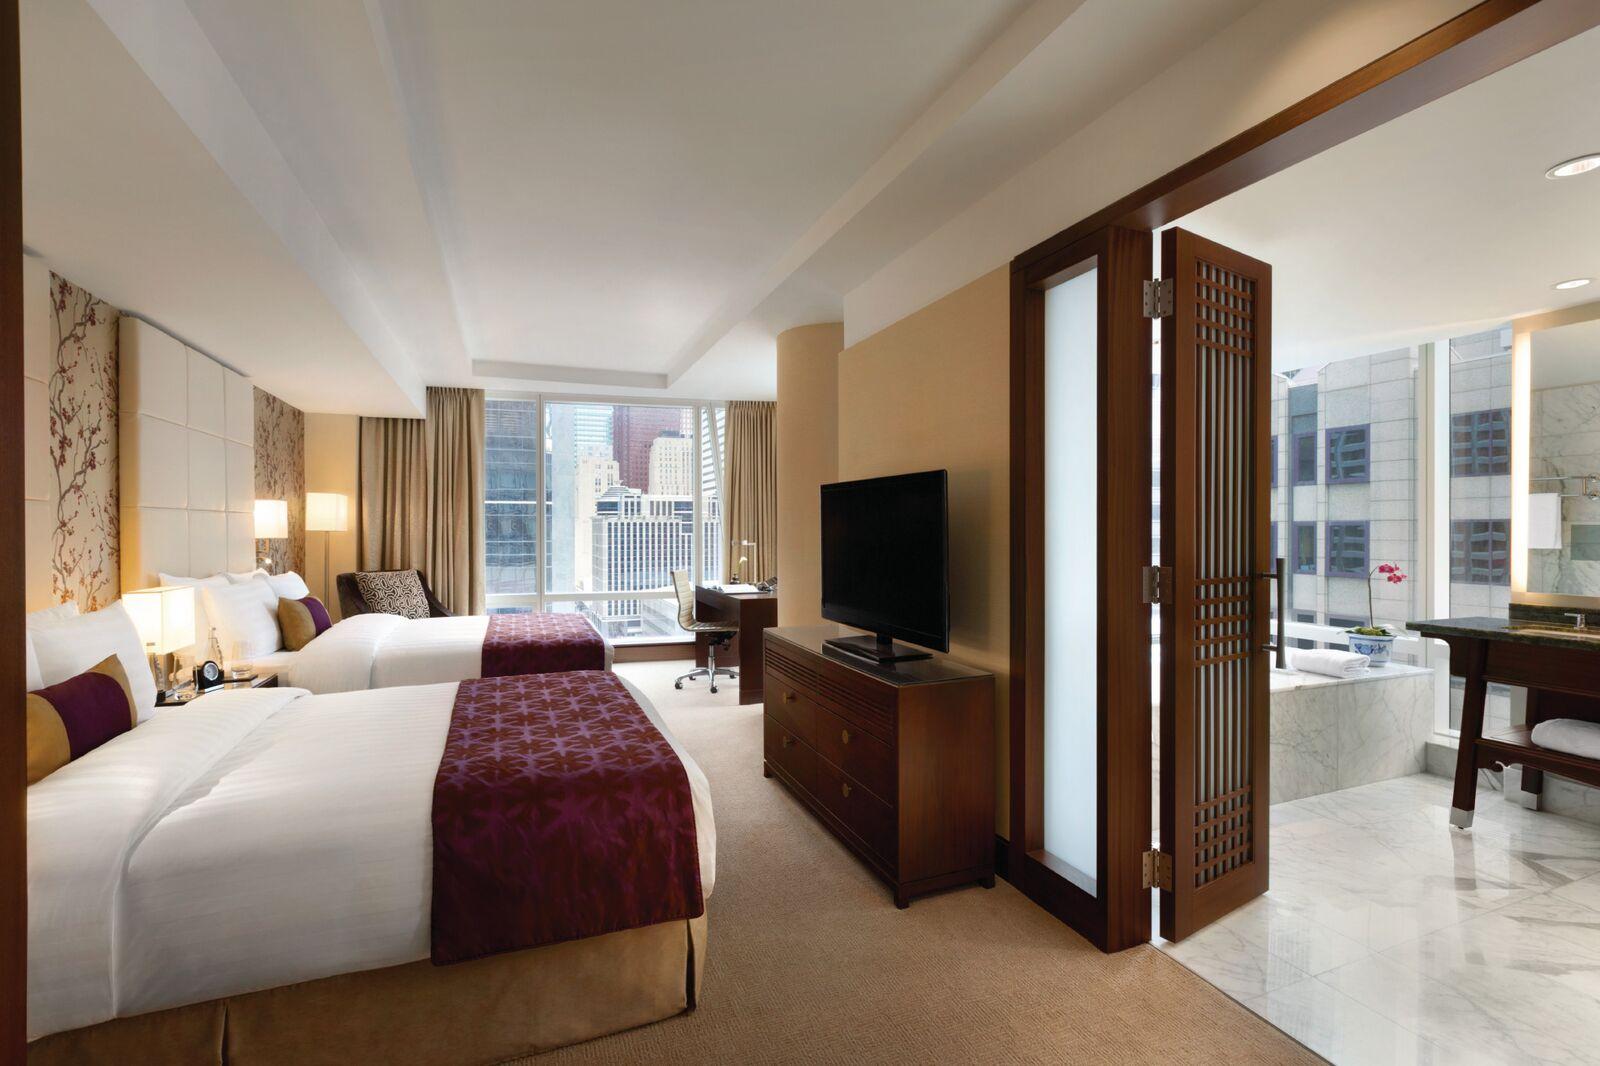 Shangri-La Hotel Toronto - 2 Twin Guest Room - 1194435_preview.jpeg